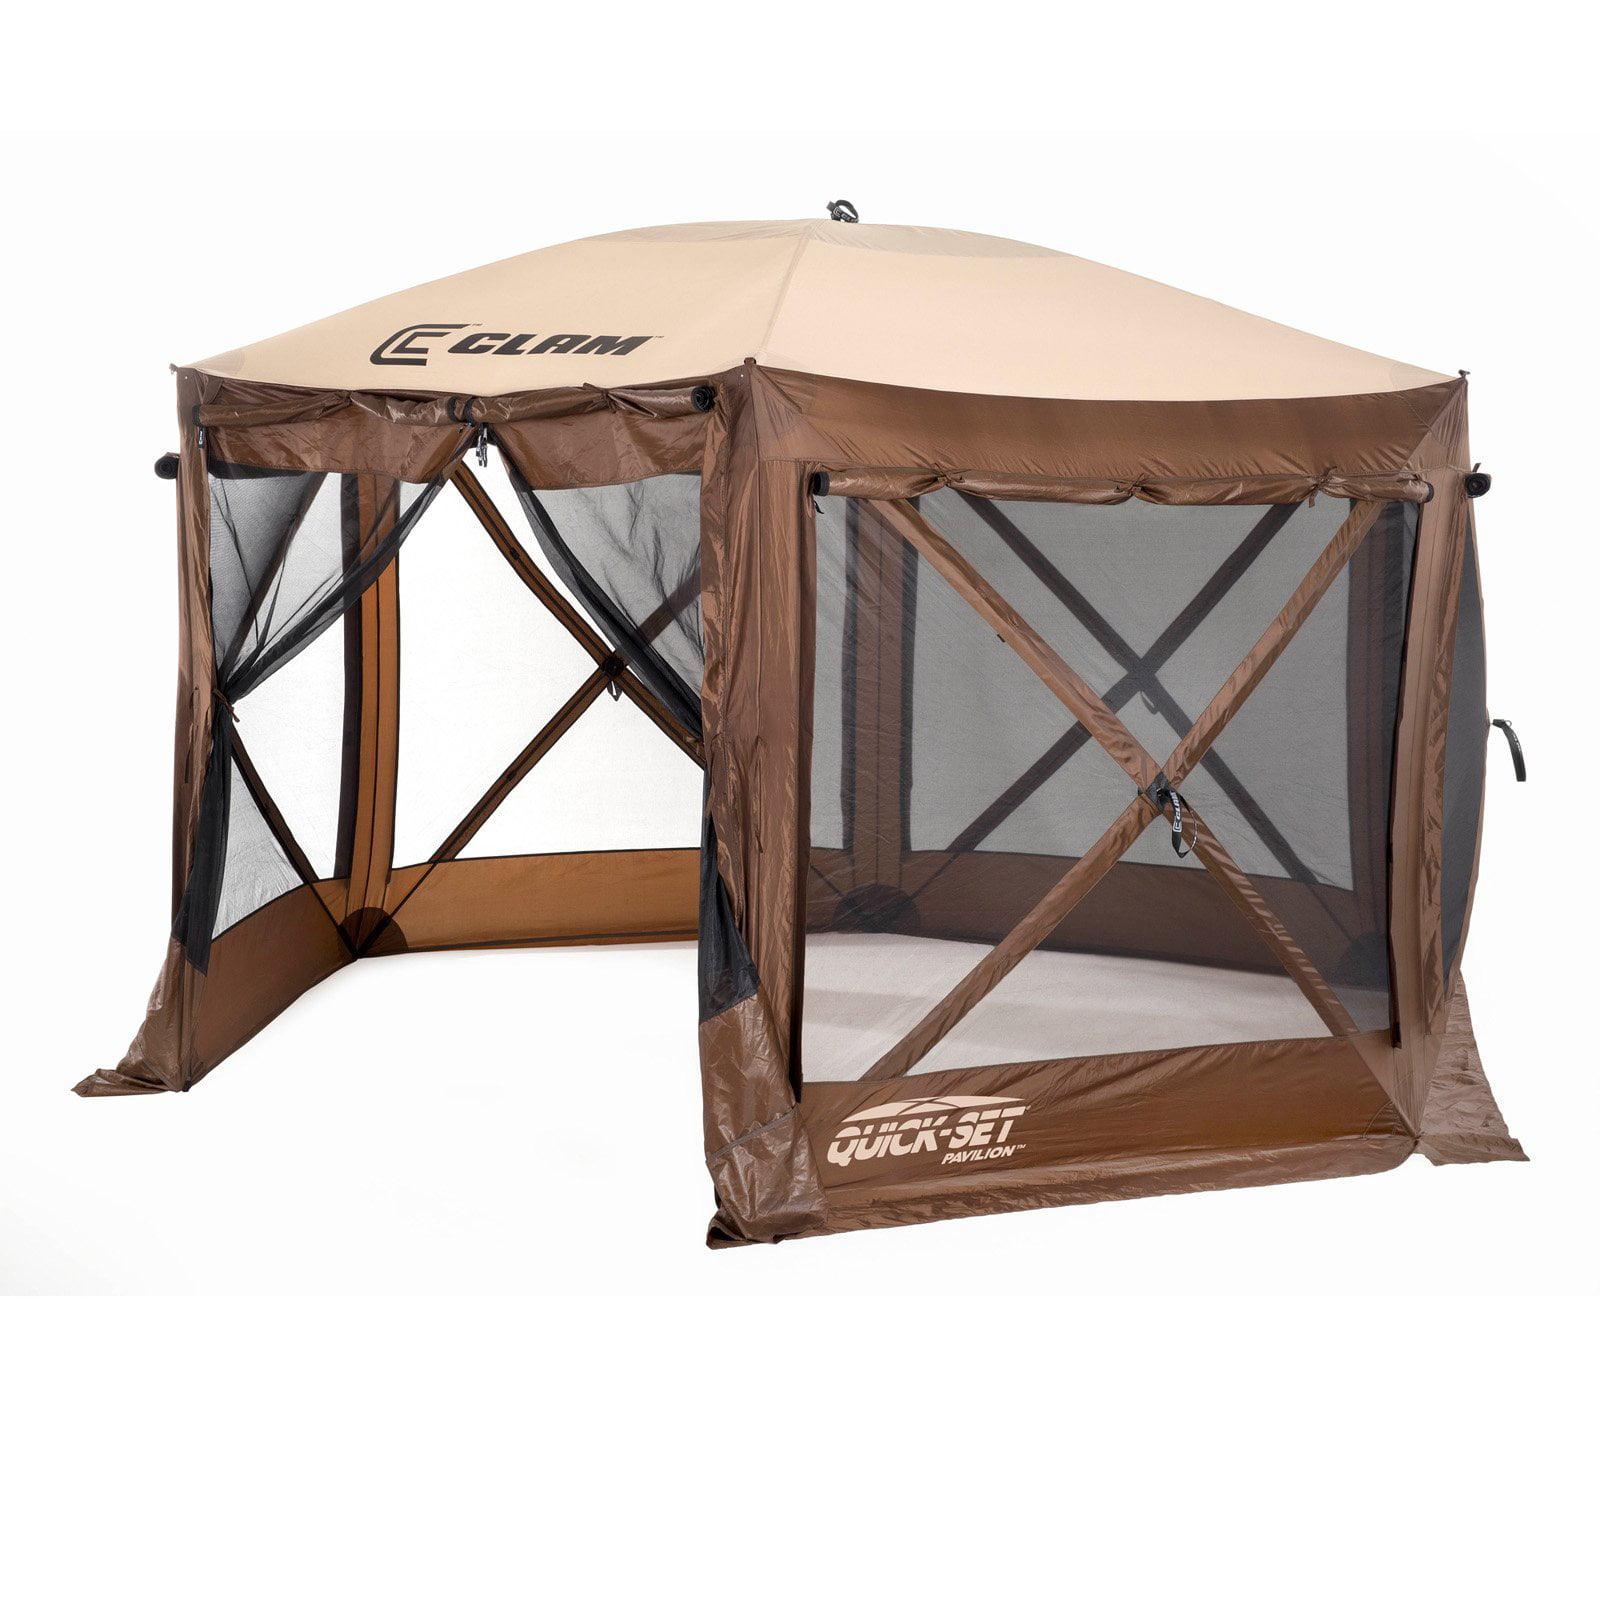 Clam Quick-Set Pavilion 6 Side DLX Canopy Shelter